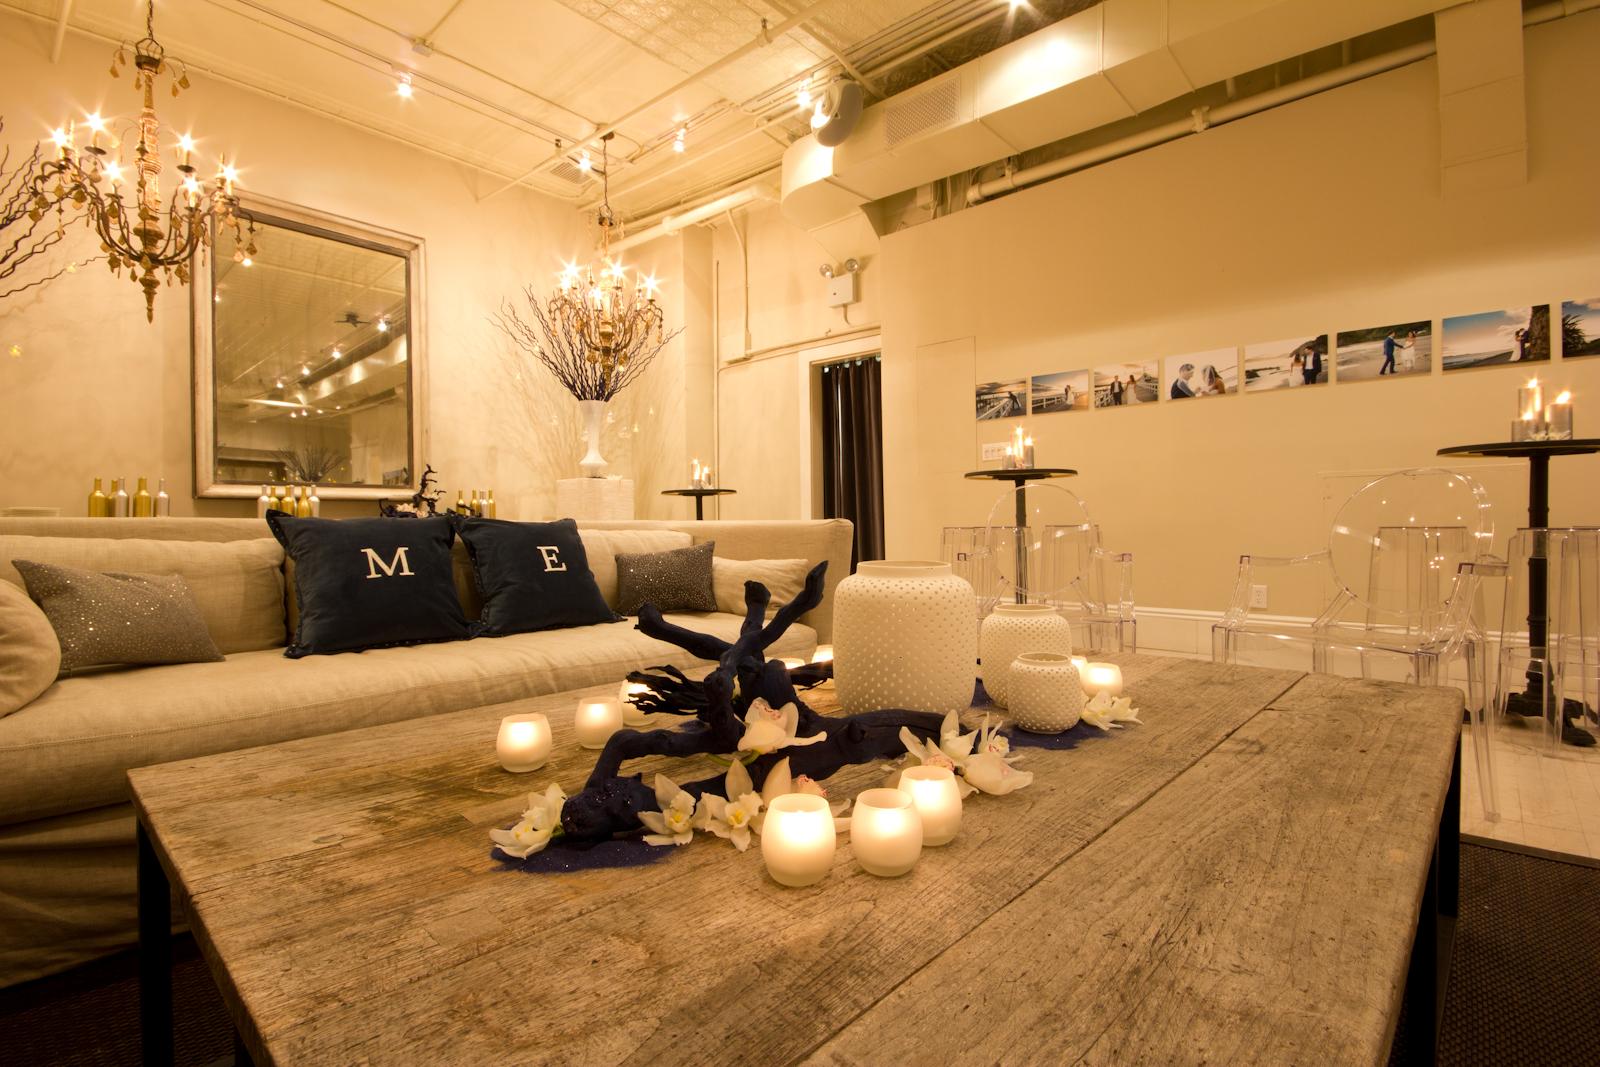 Custom wedding decor in The Sixth Floor Loft's lounge space